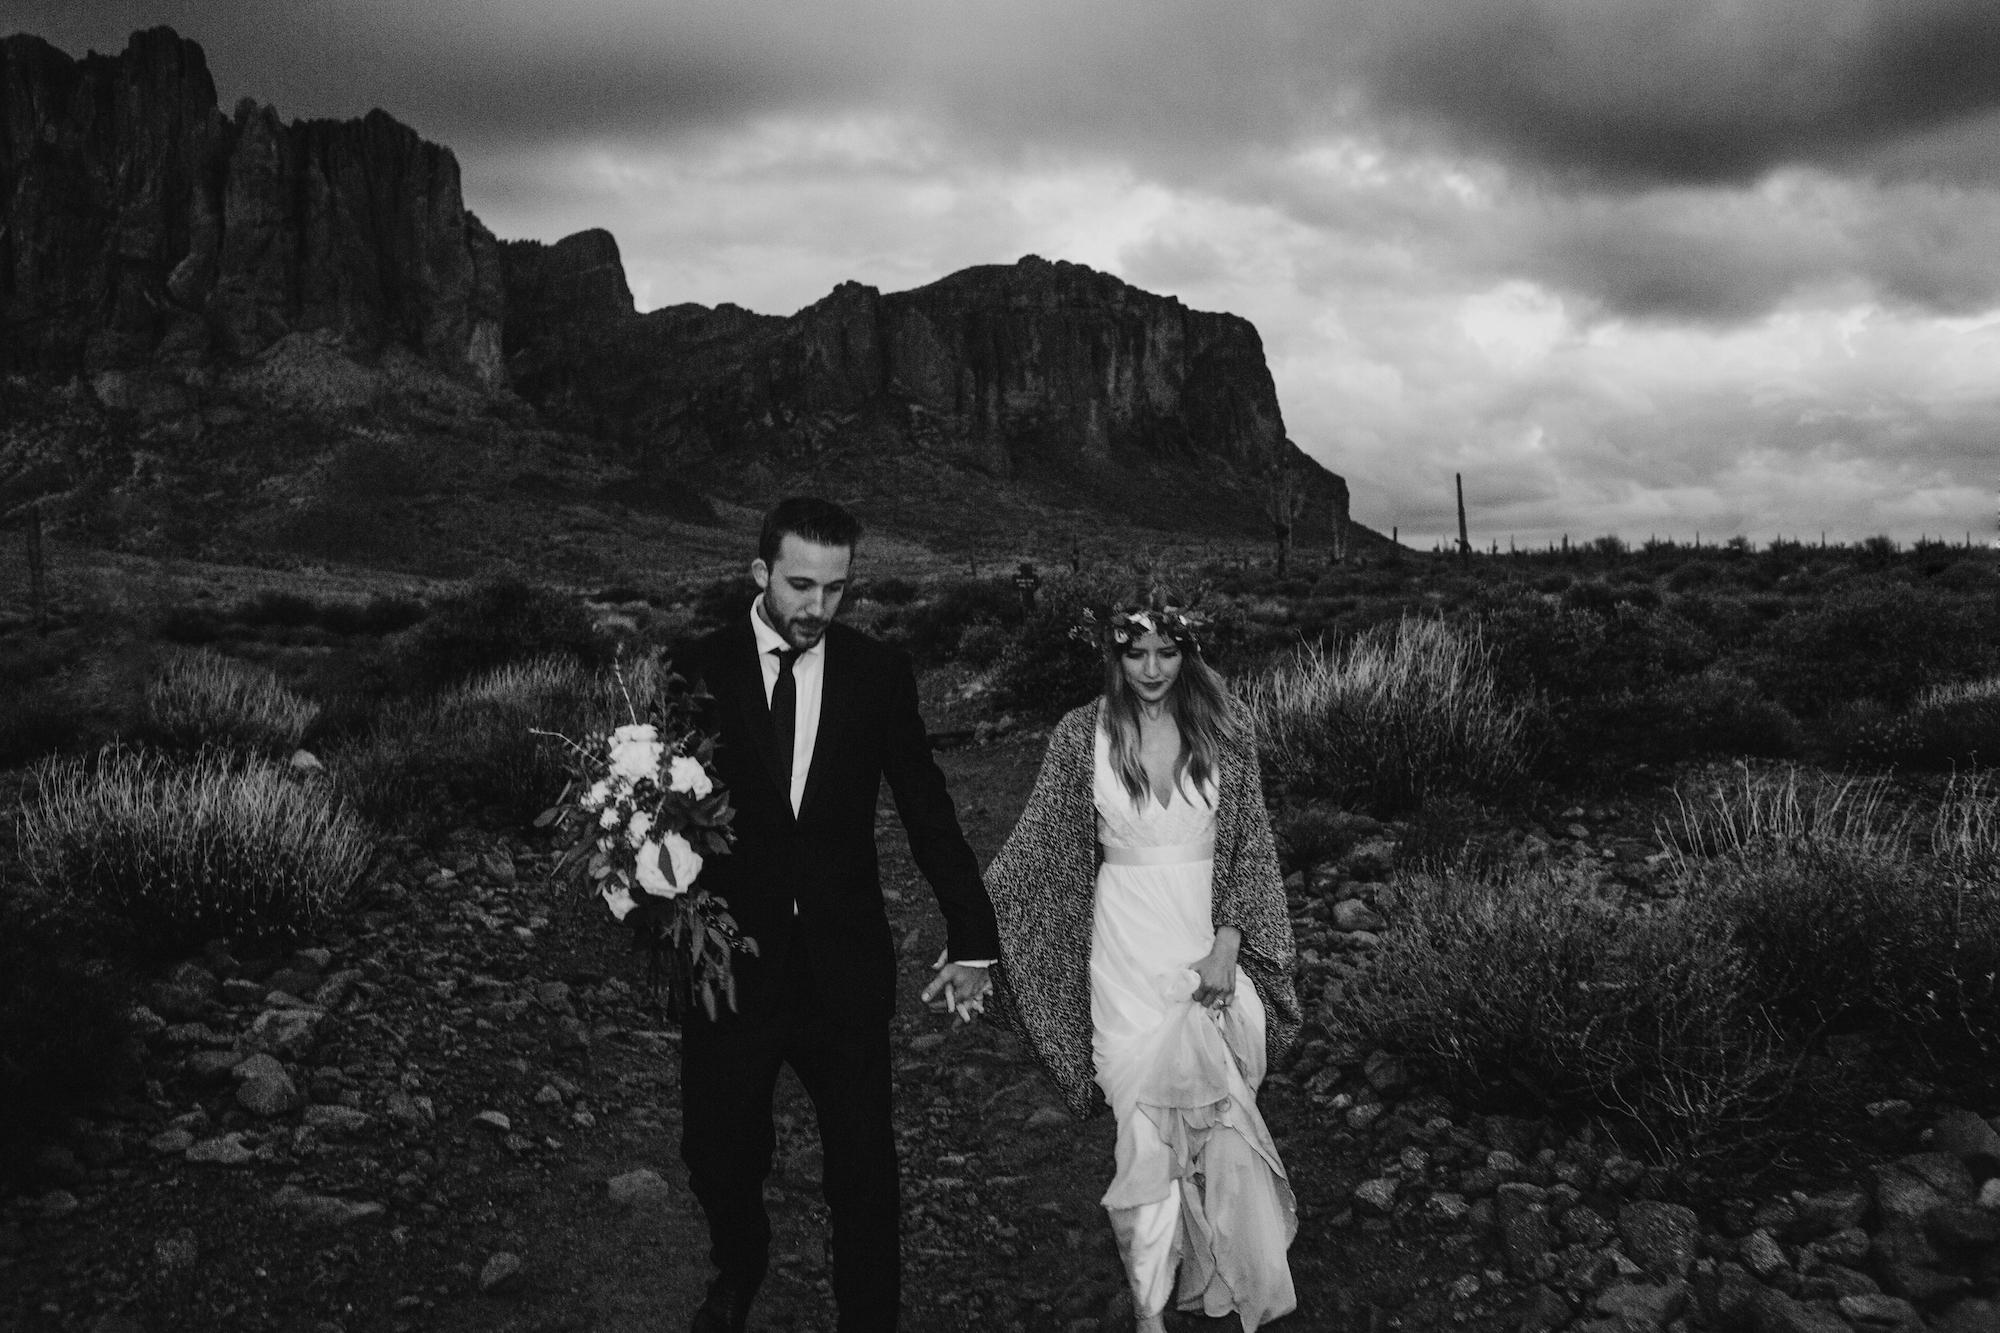 arizona - wedding - photographer858.jpg